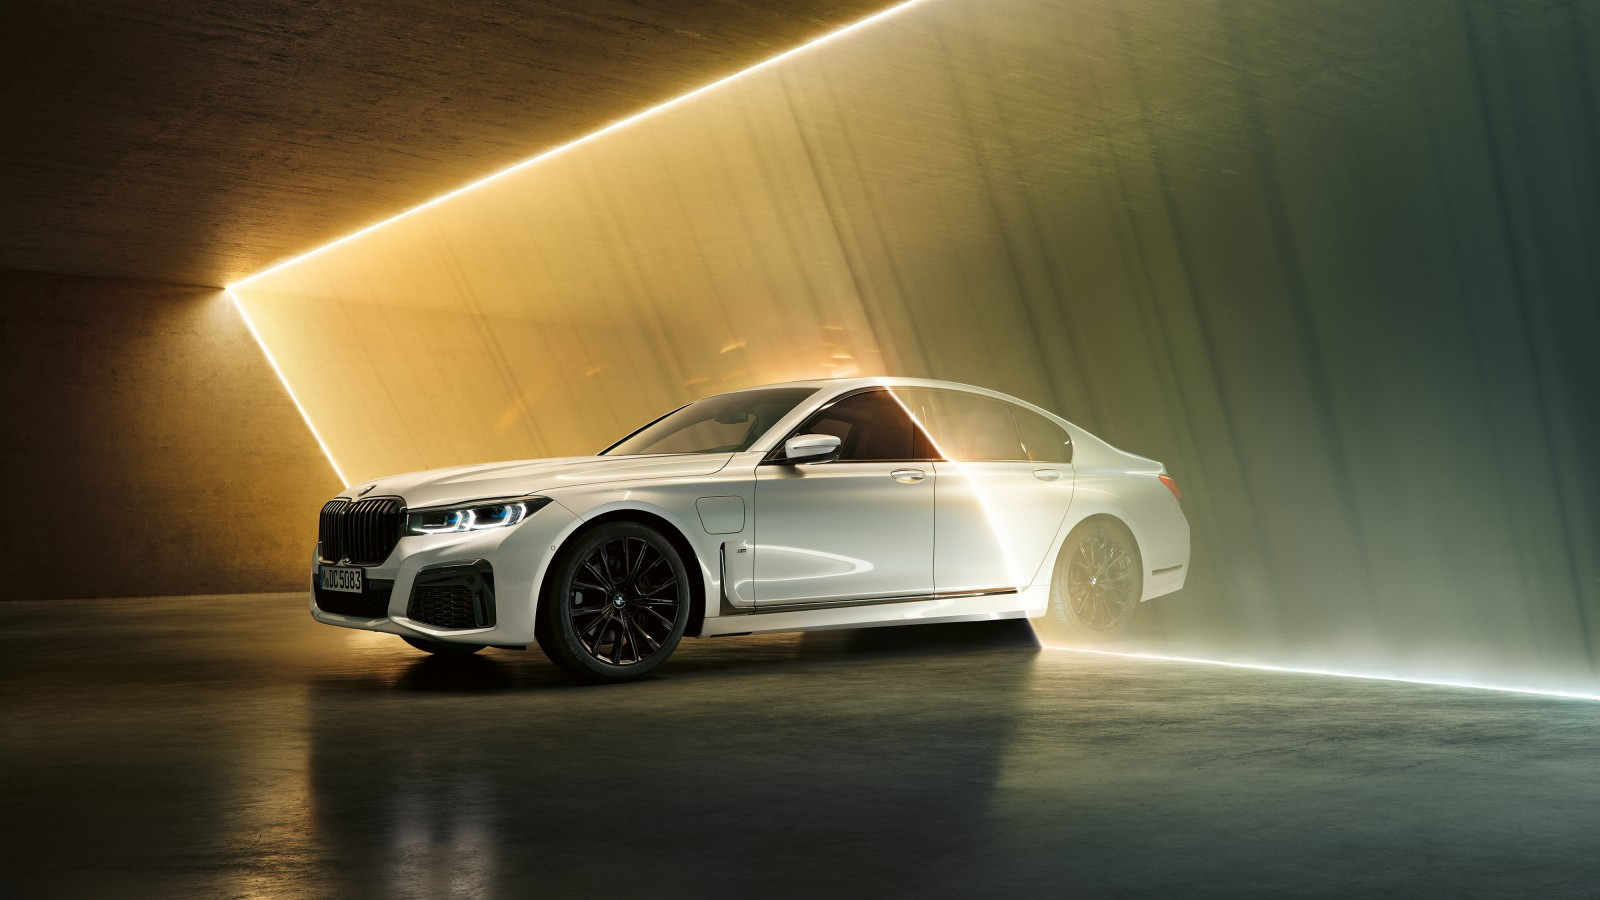 2020 BMW 745e M Sport 4K Wallpaper | HD Car Wallpapers ...